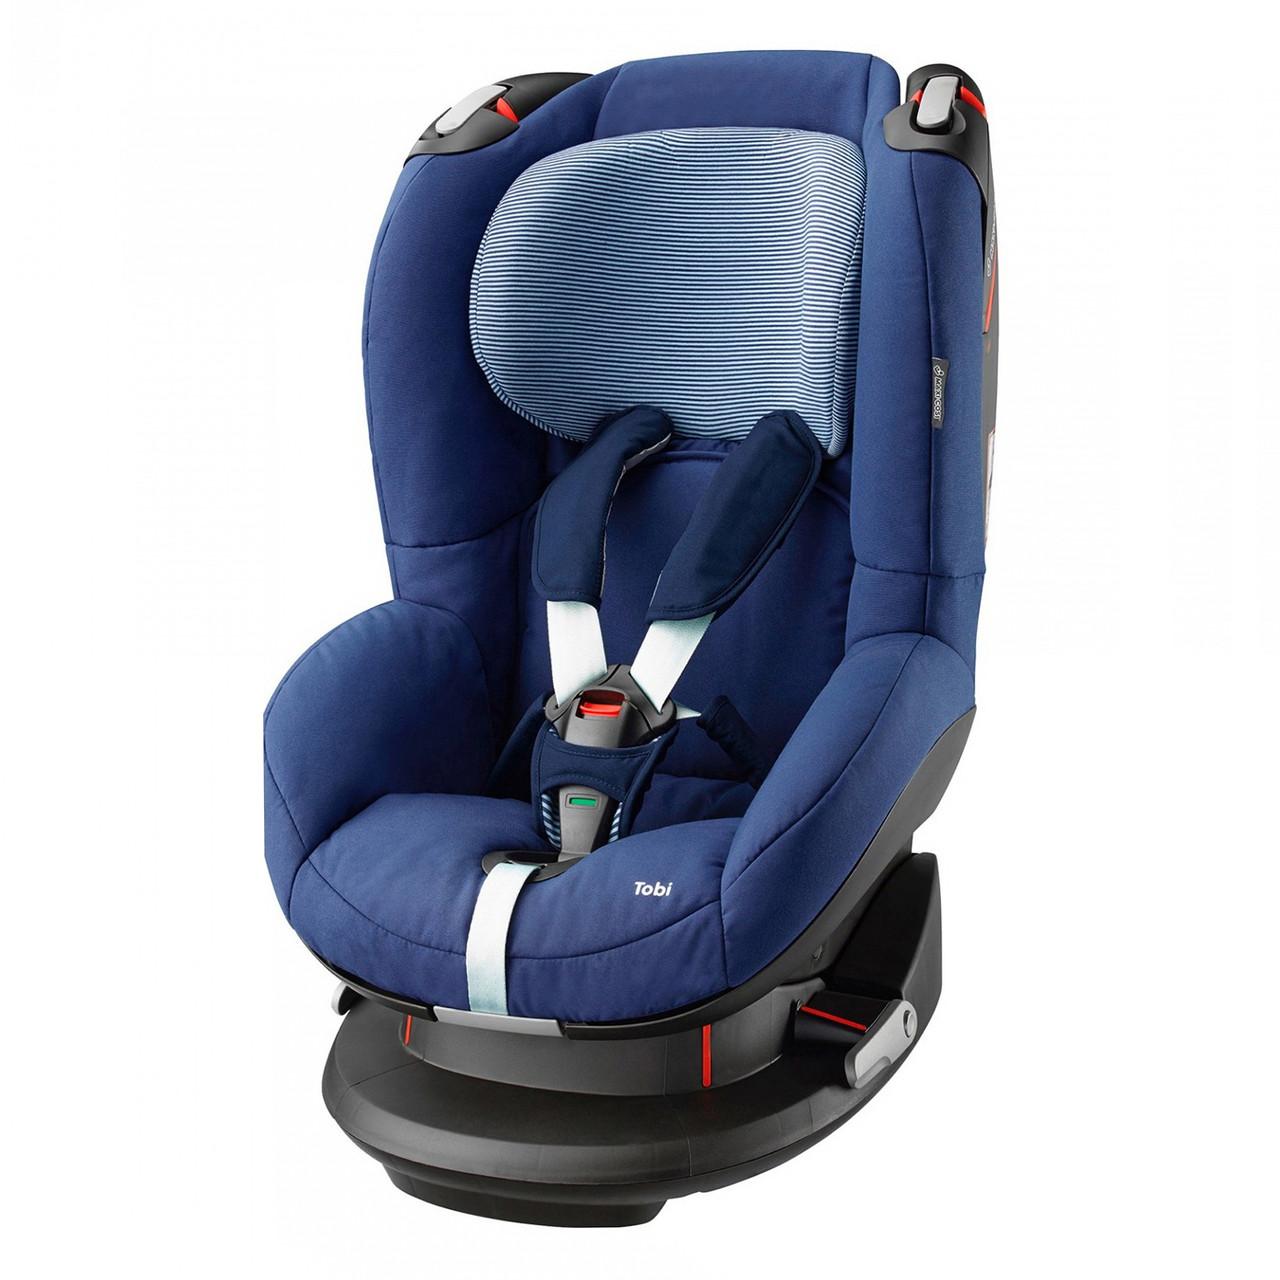 Автокресло Maxi Cosi Tobi 9-18 кг (60108970) River Blue (синий)